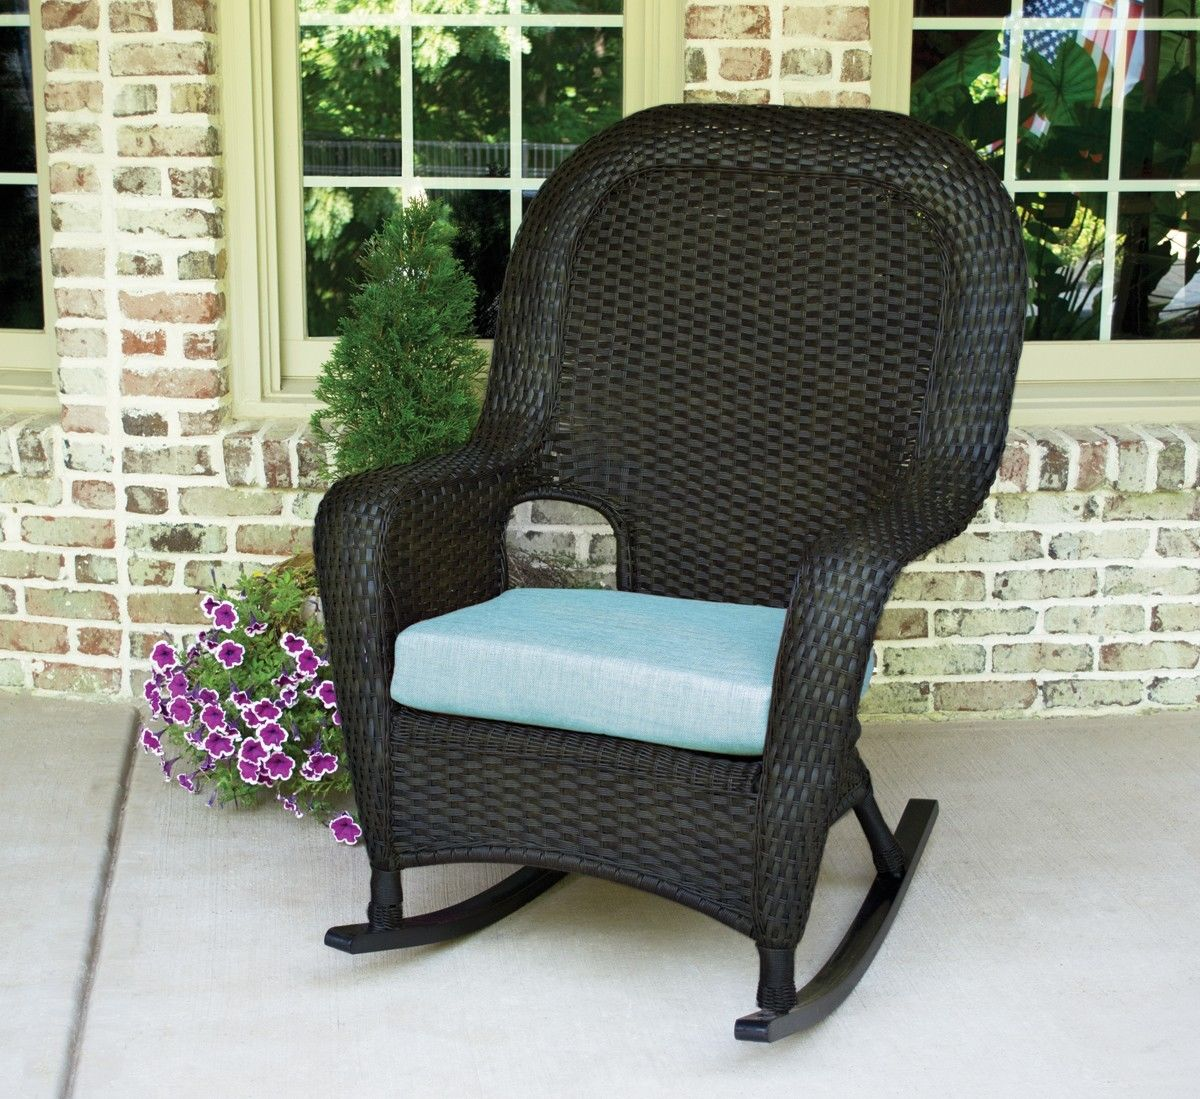 #82 - Outdoor Patio Garden Furniture Tortoise Resin Wicker Rocking Chair in Rave Spearmint